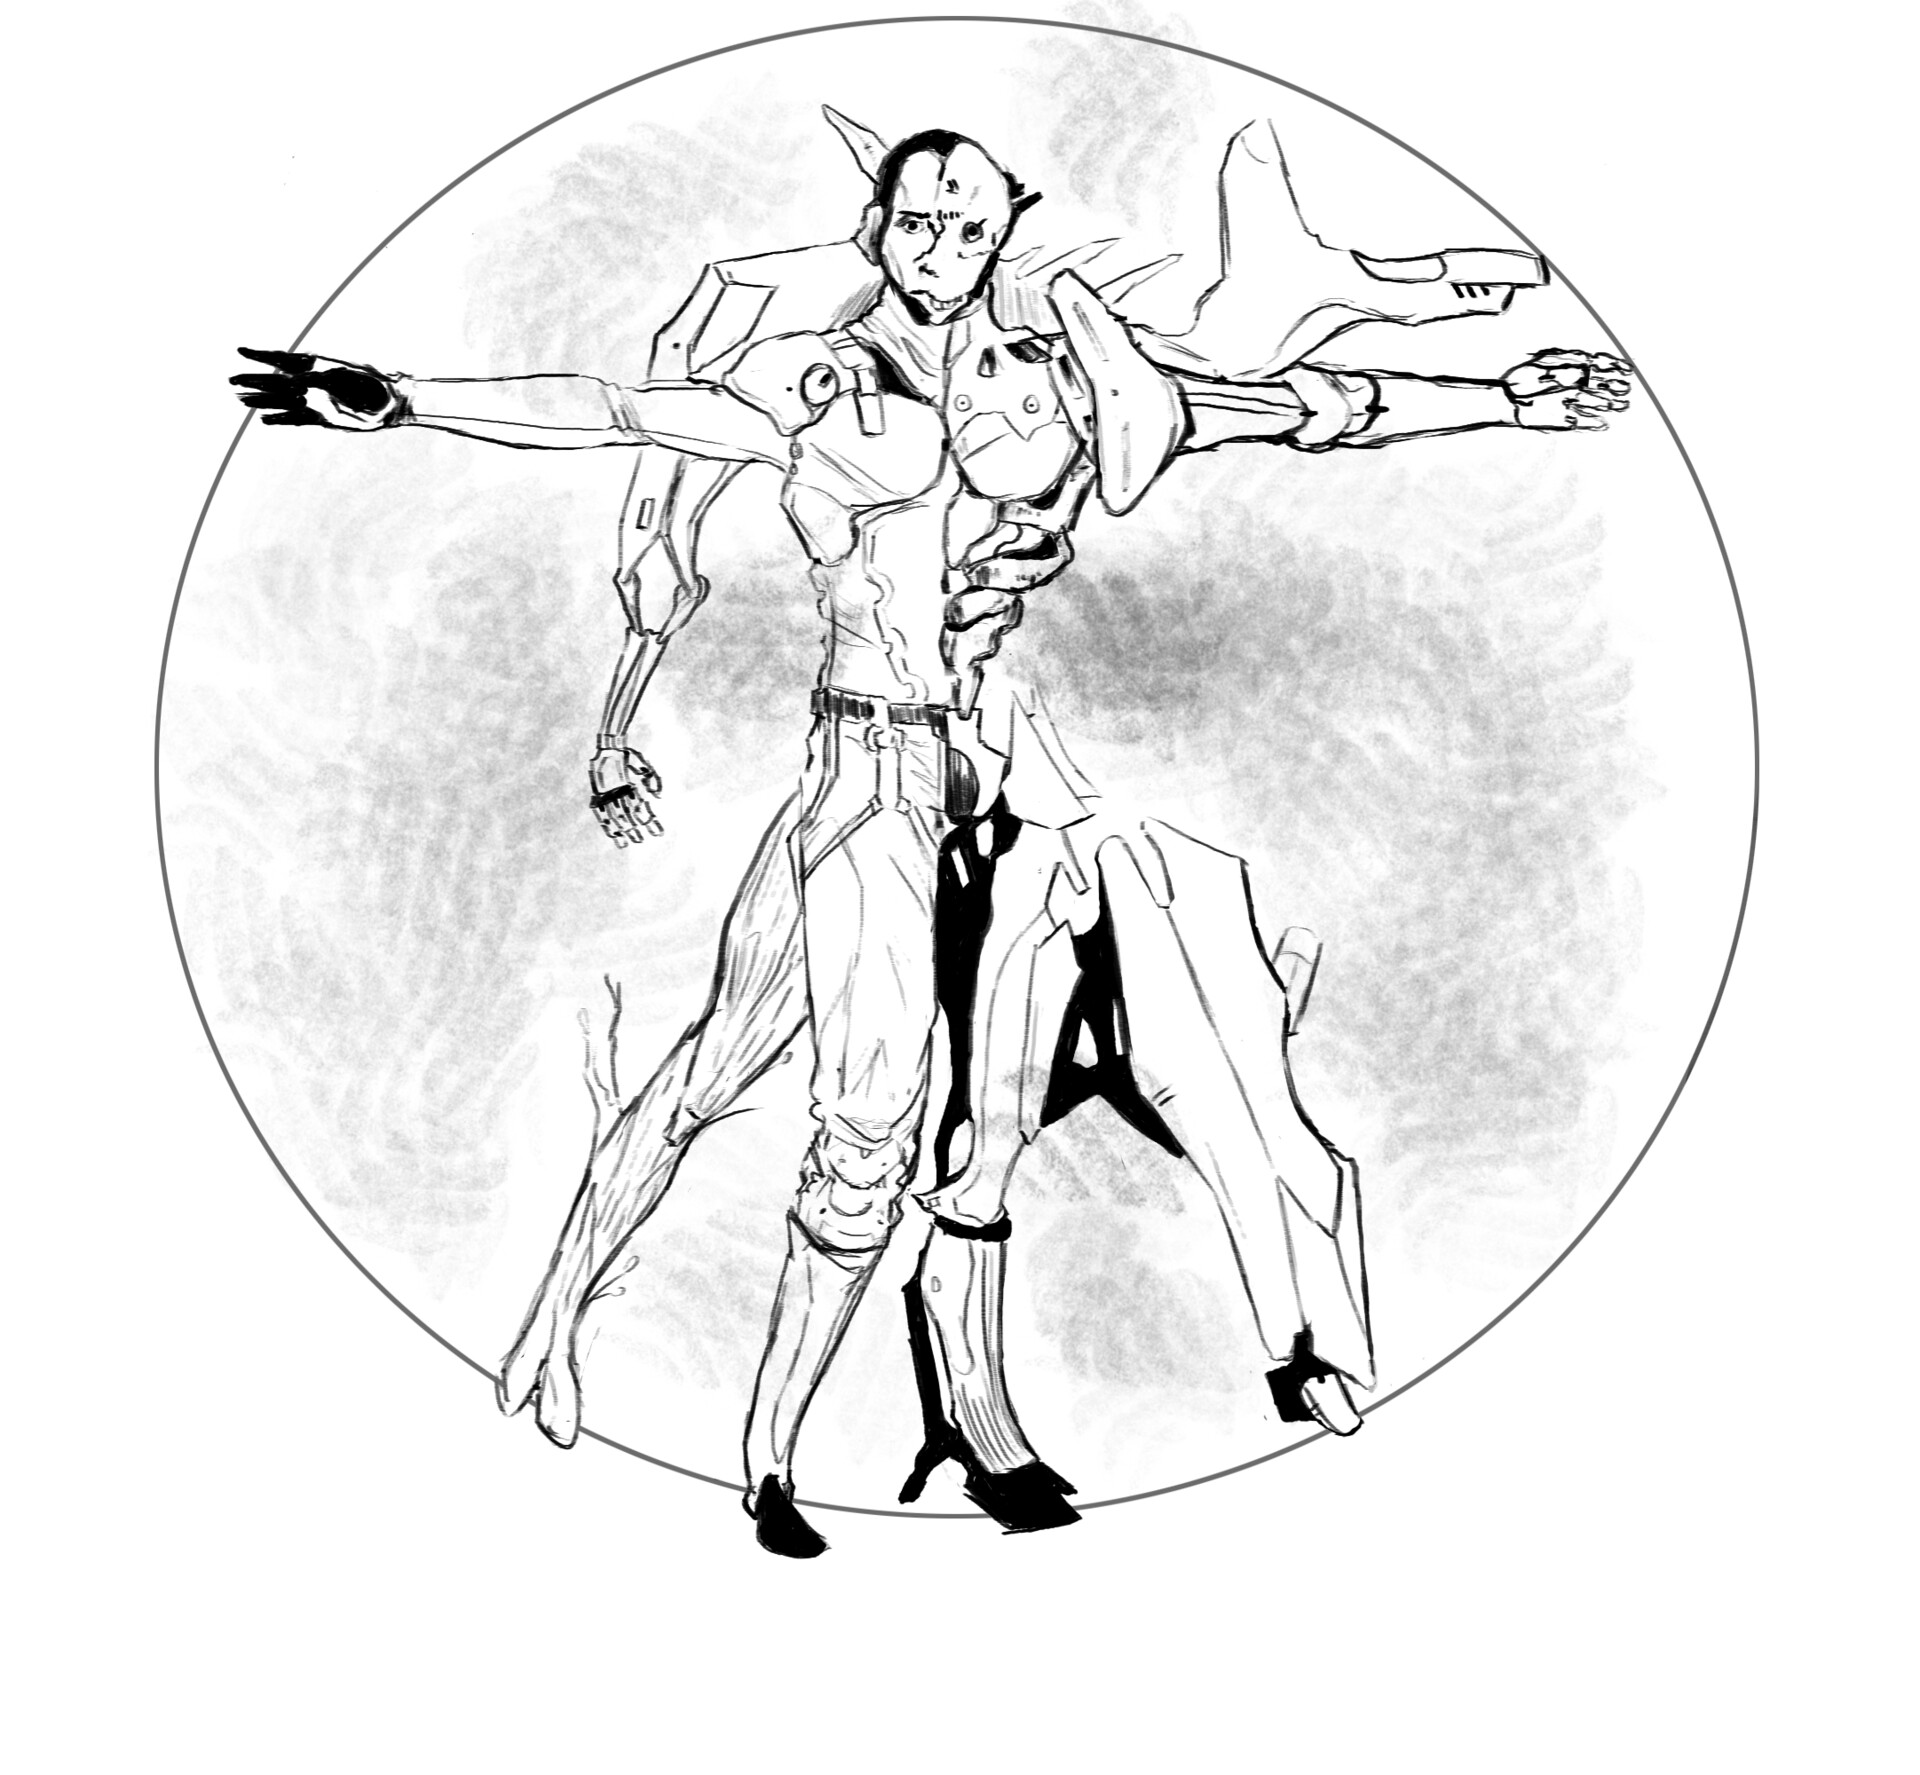 ArtStation - Character Sheet Template, Emmett Shatley